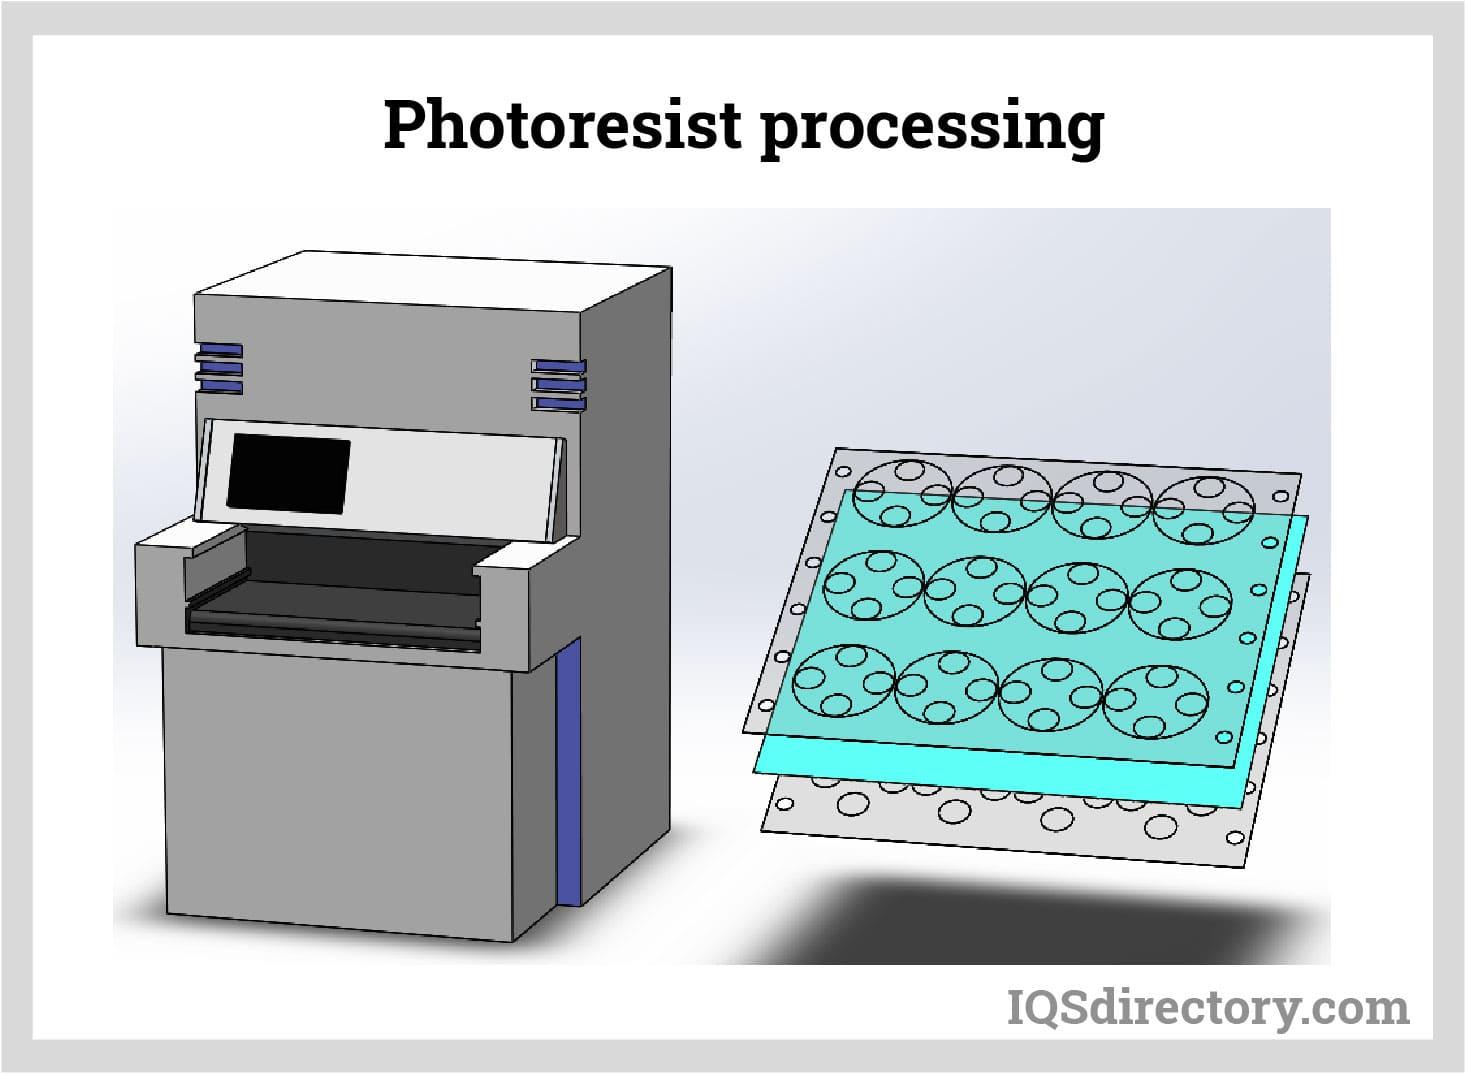 Photoresist processing